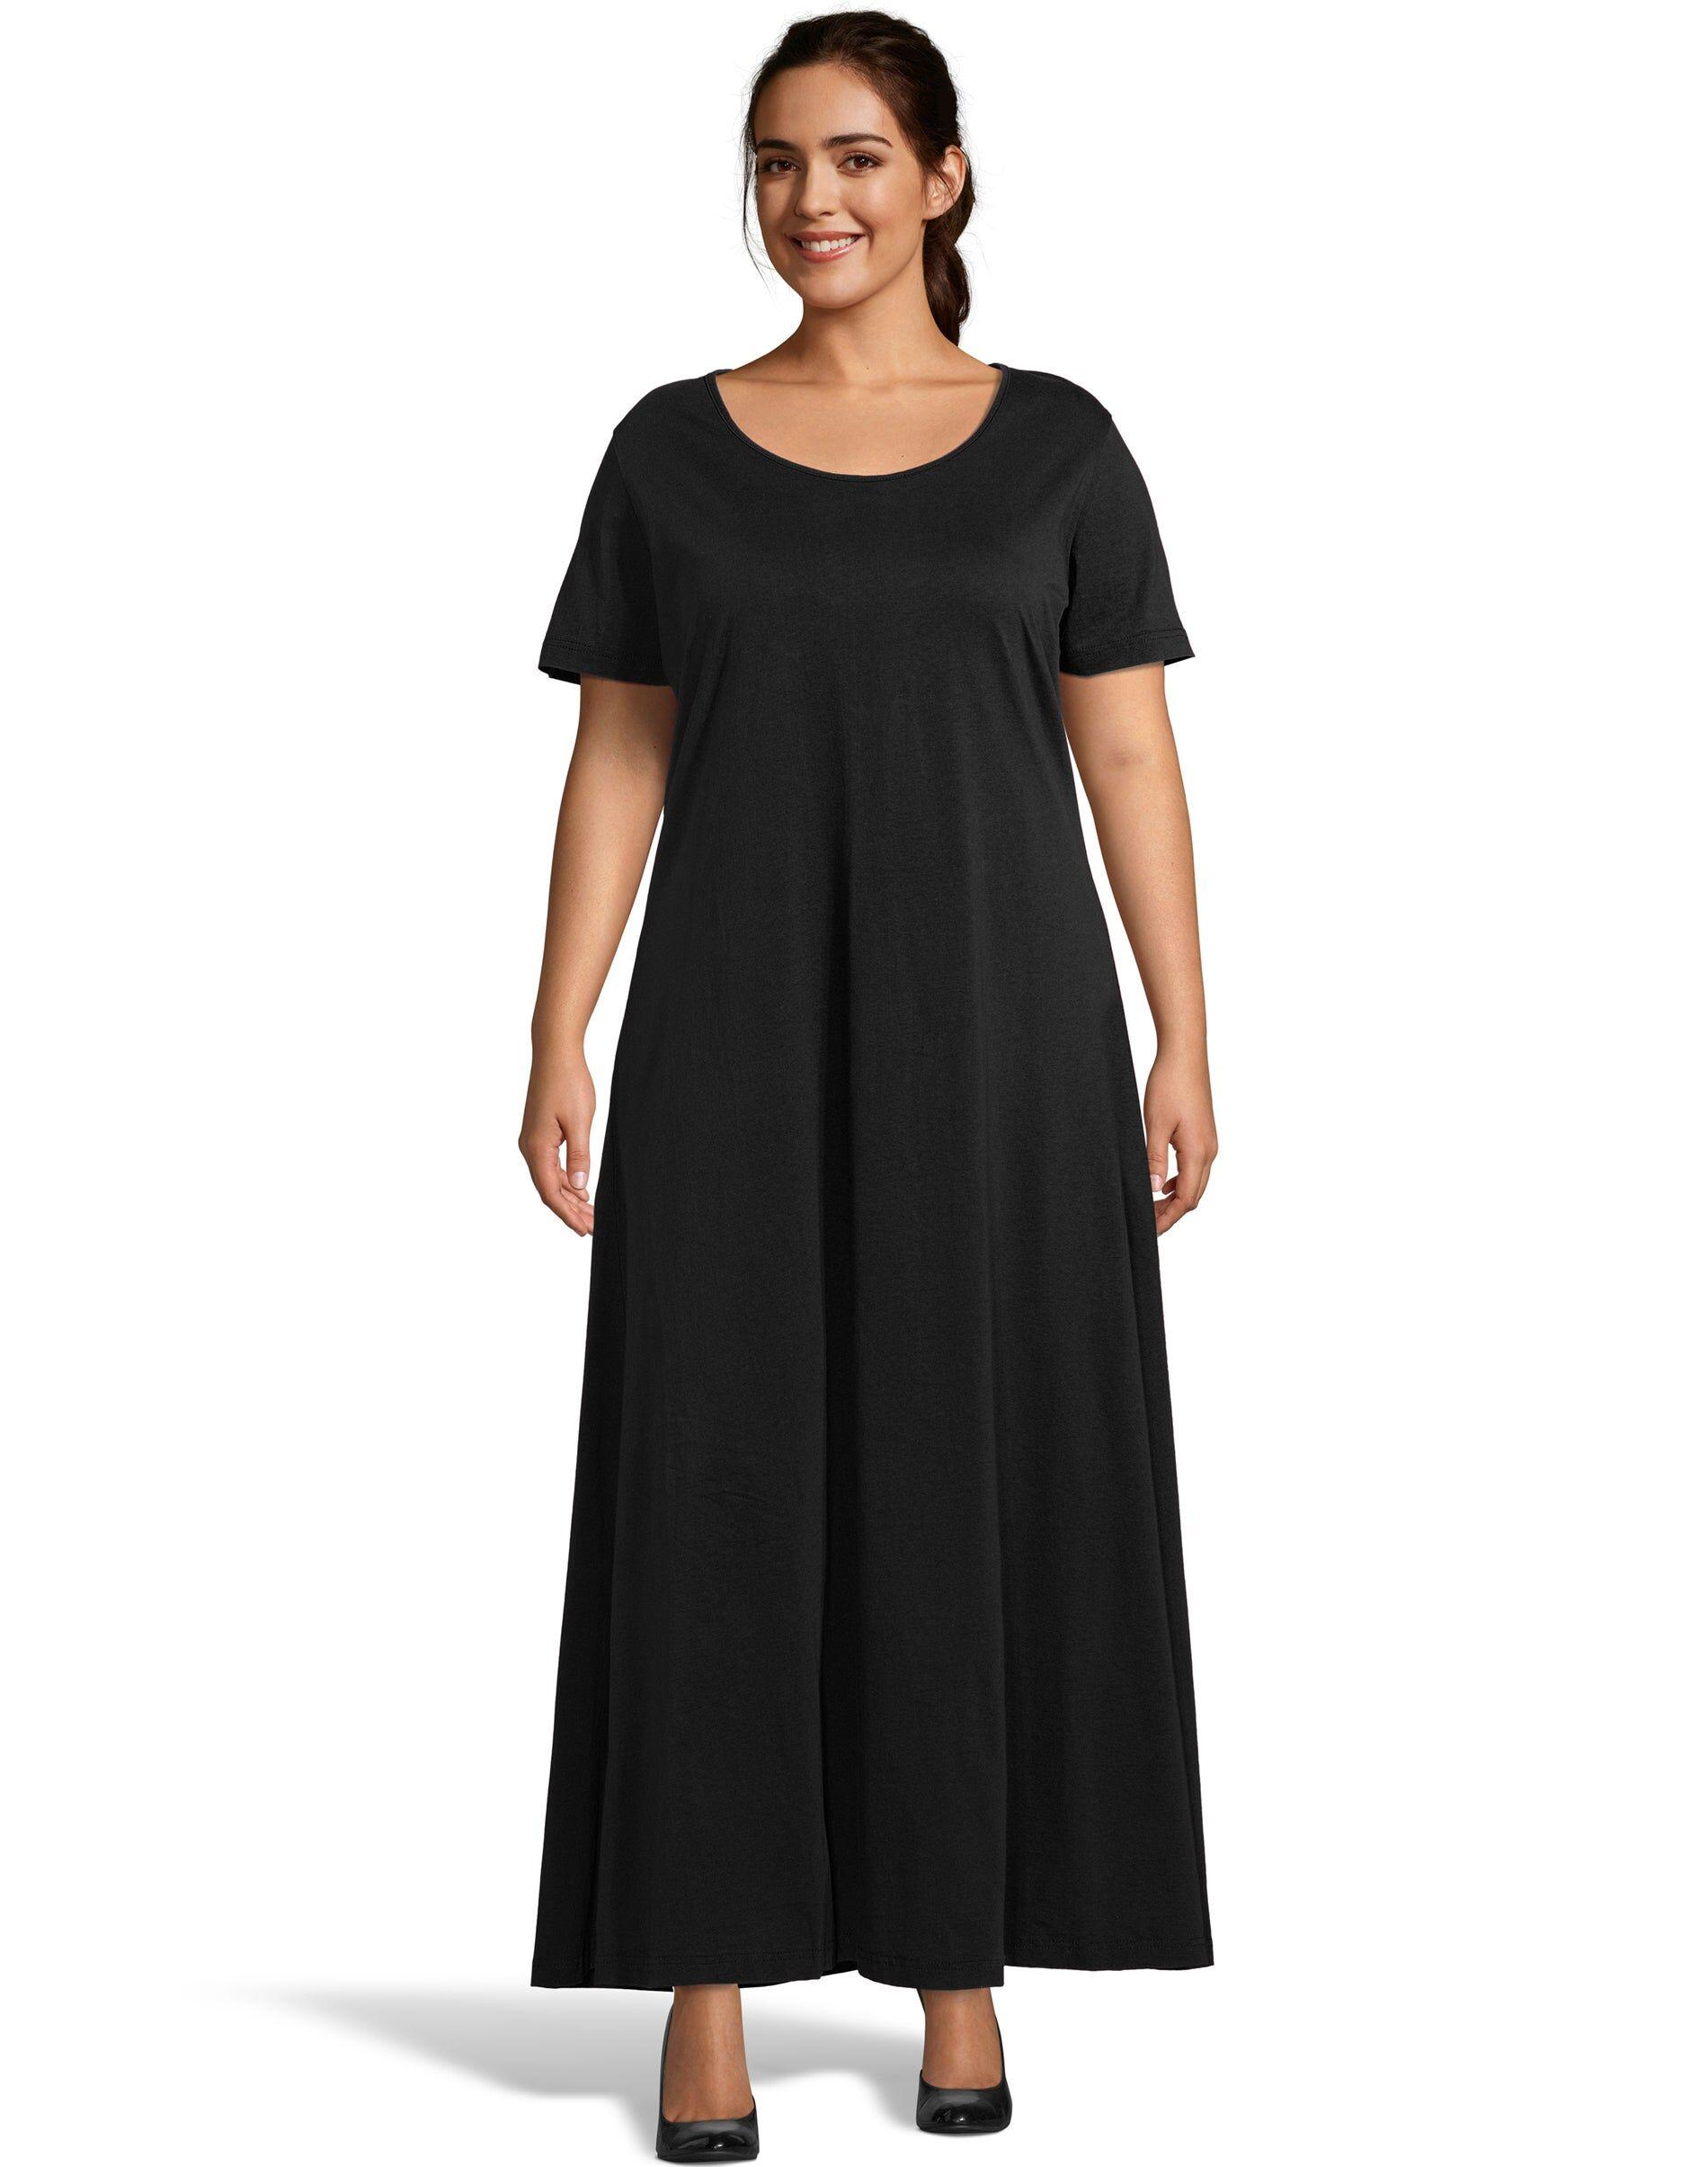 Just My Size Jersey Matchables Maxi Dress Black 1X Women's